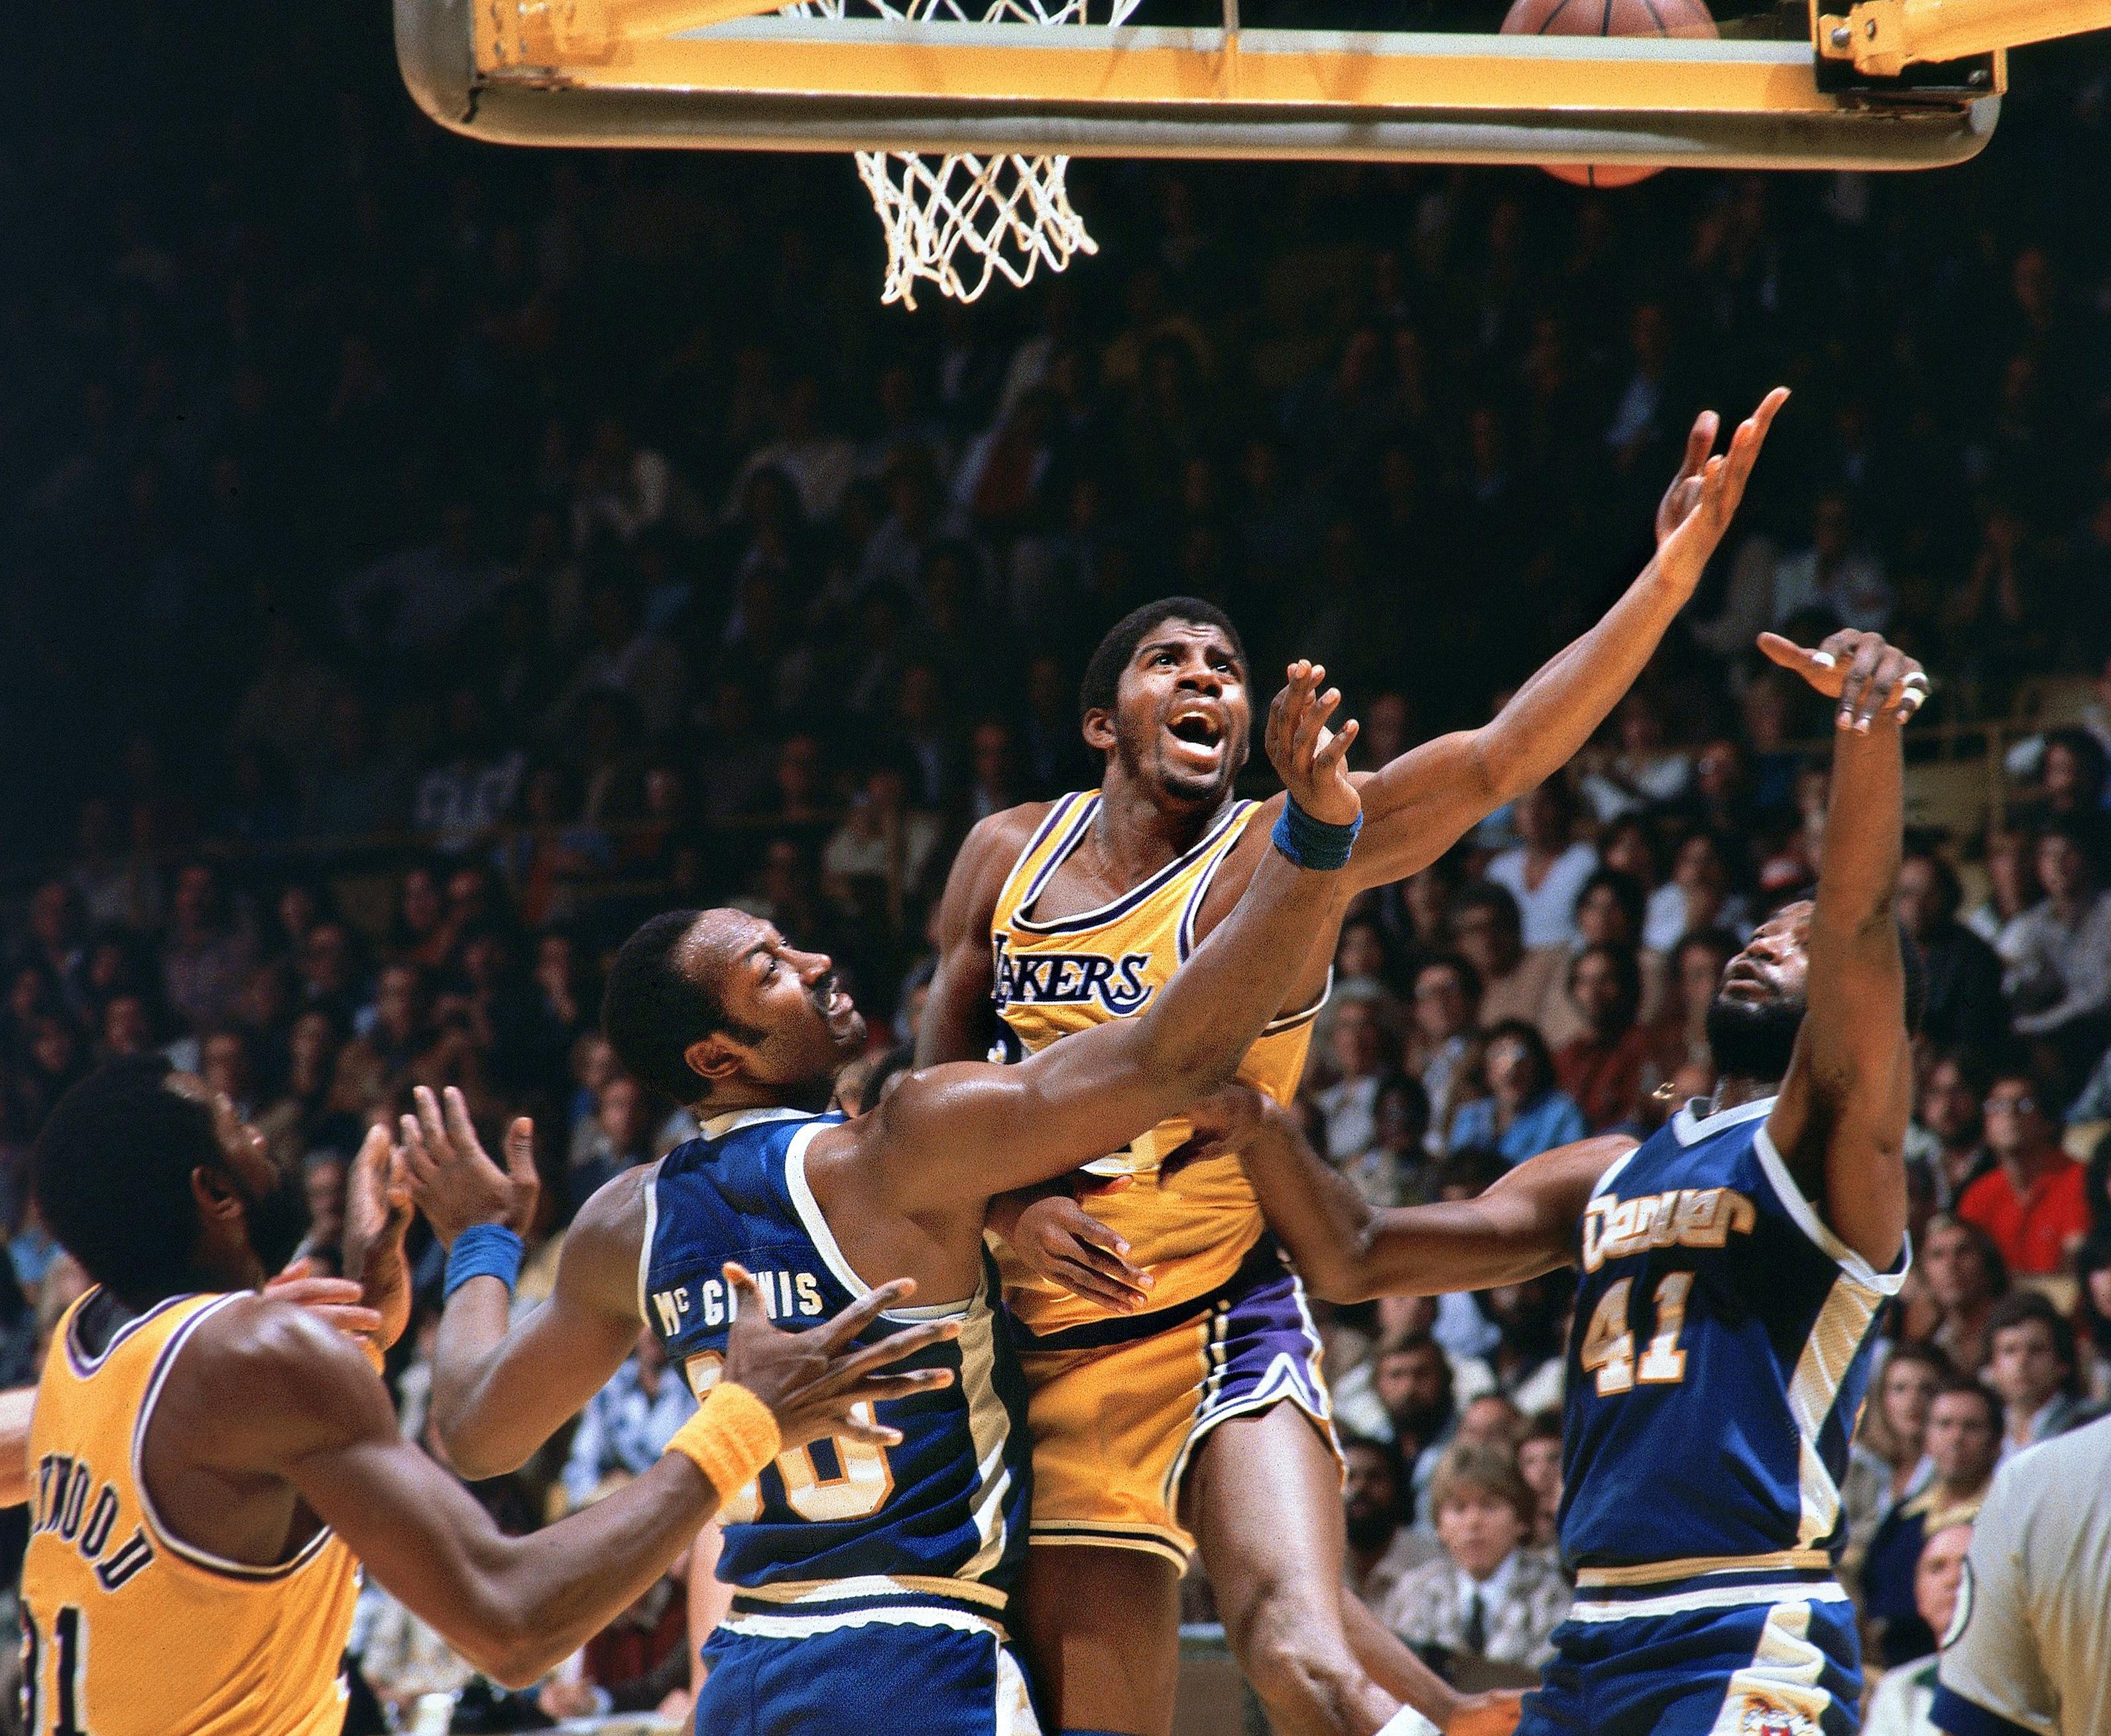 Nba Basketball Los Angeles Lakers: NBA: 25 Greatest Rookie Seasons Of All-Time